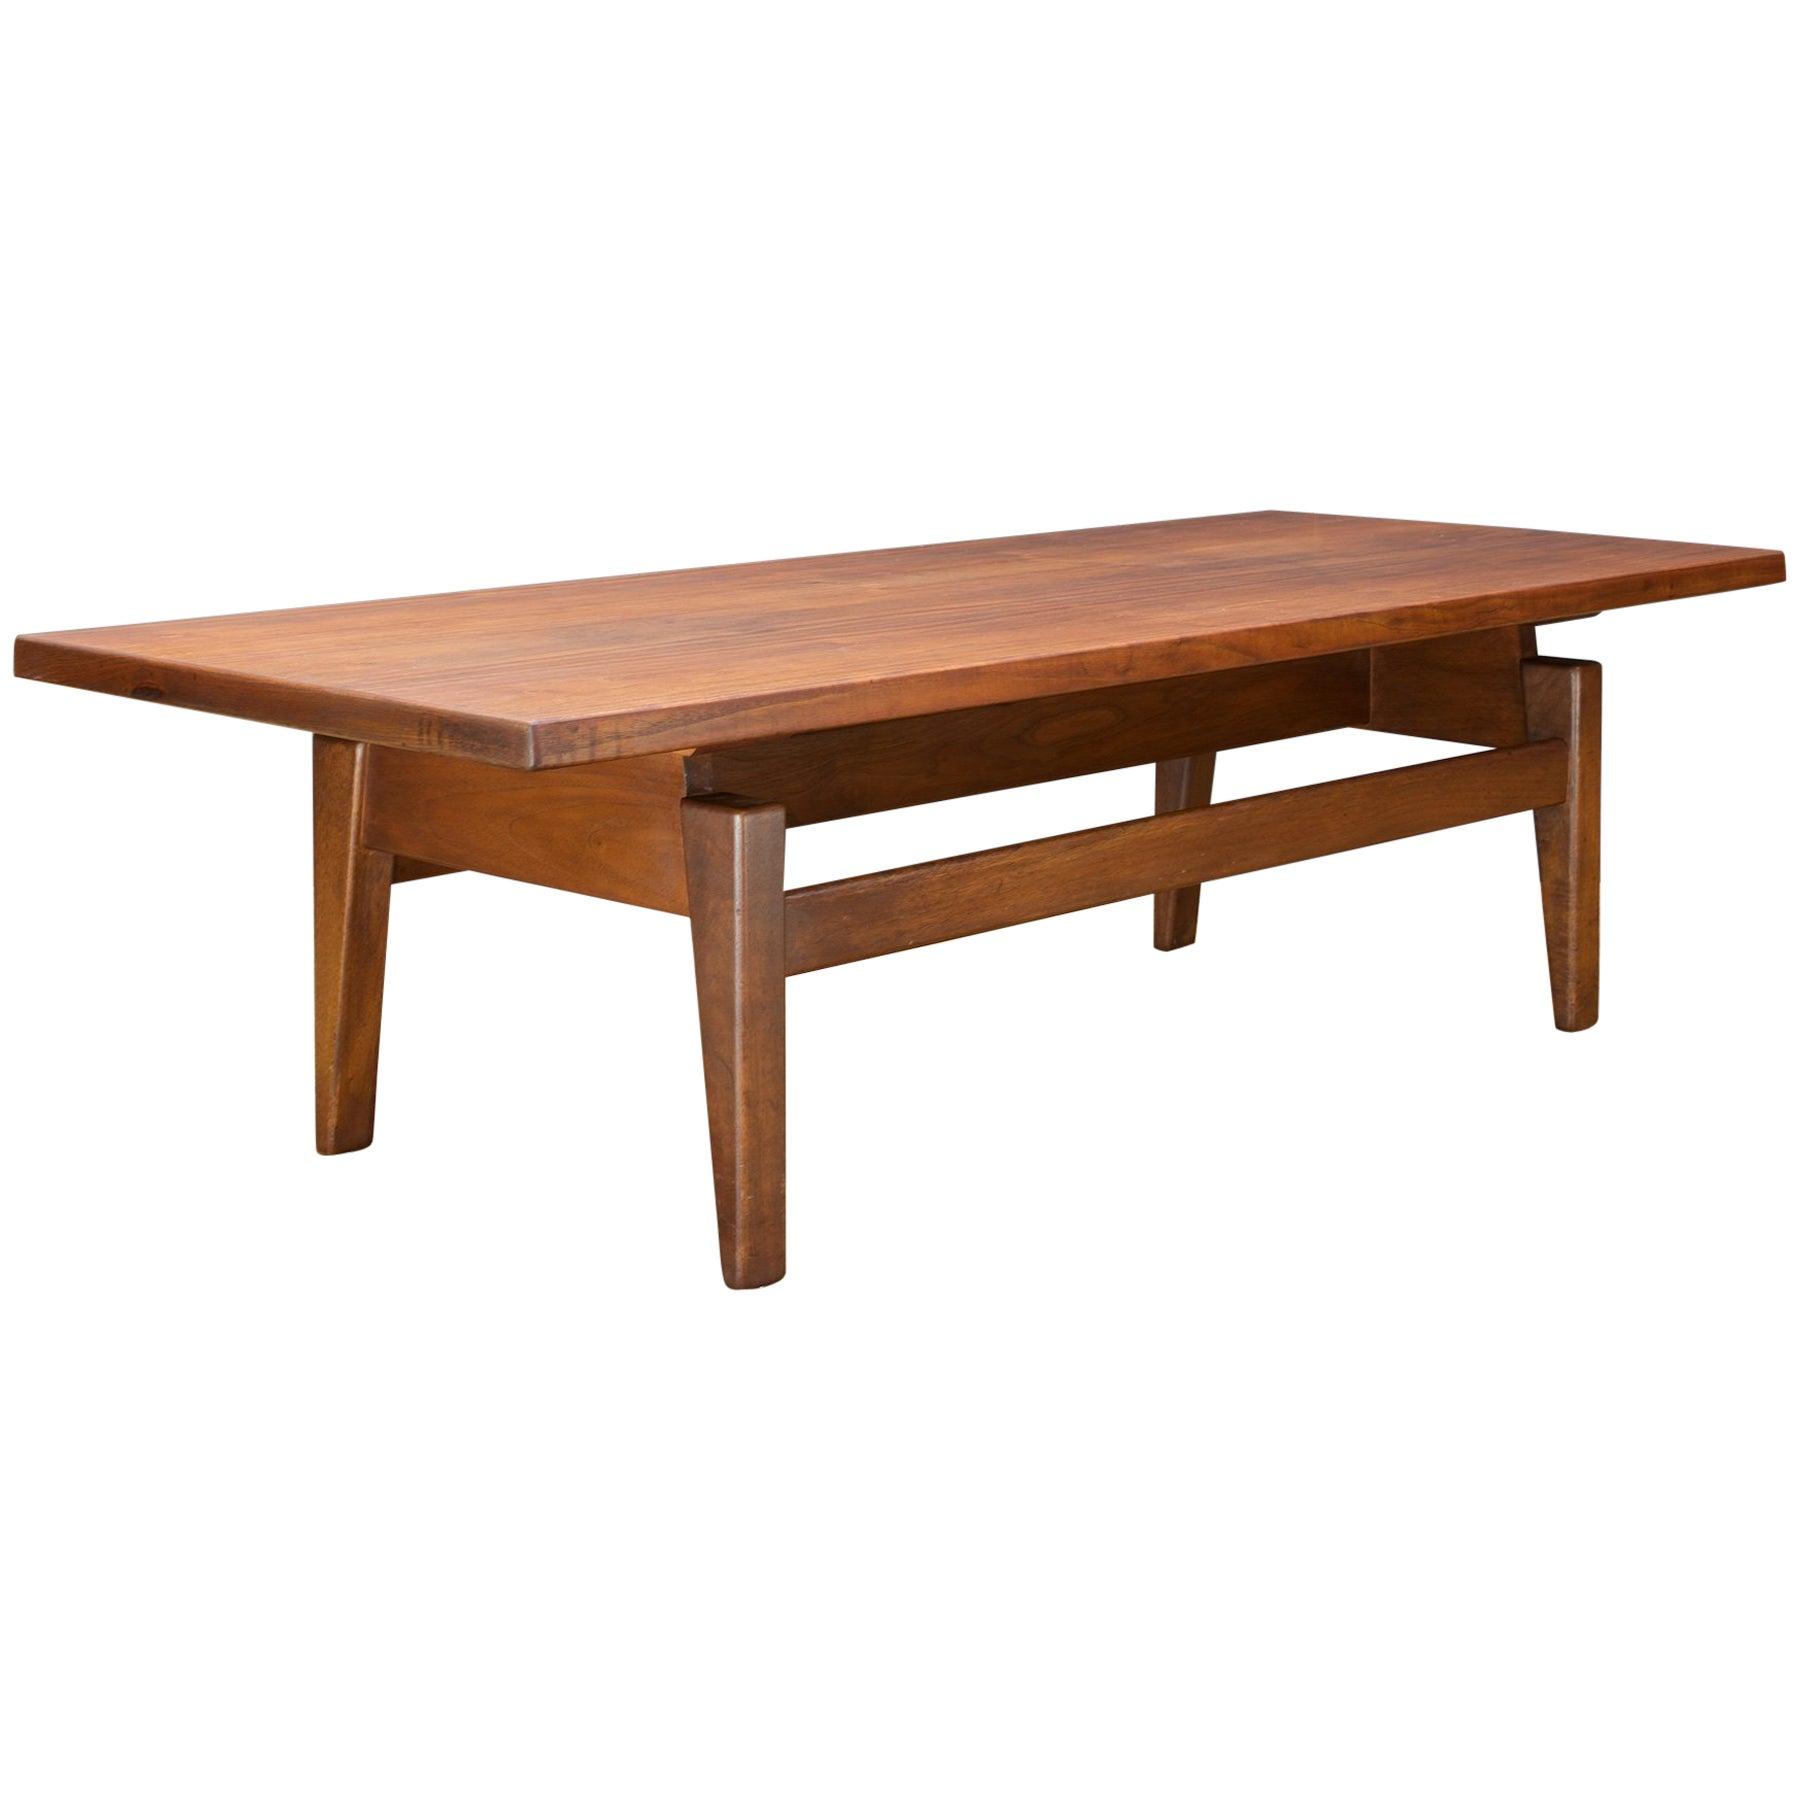 Danish American Studio Craft Risom Floating Top Walnut Coffee Table Cabinmodern